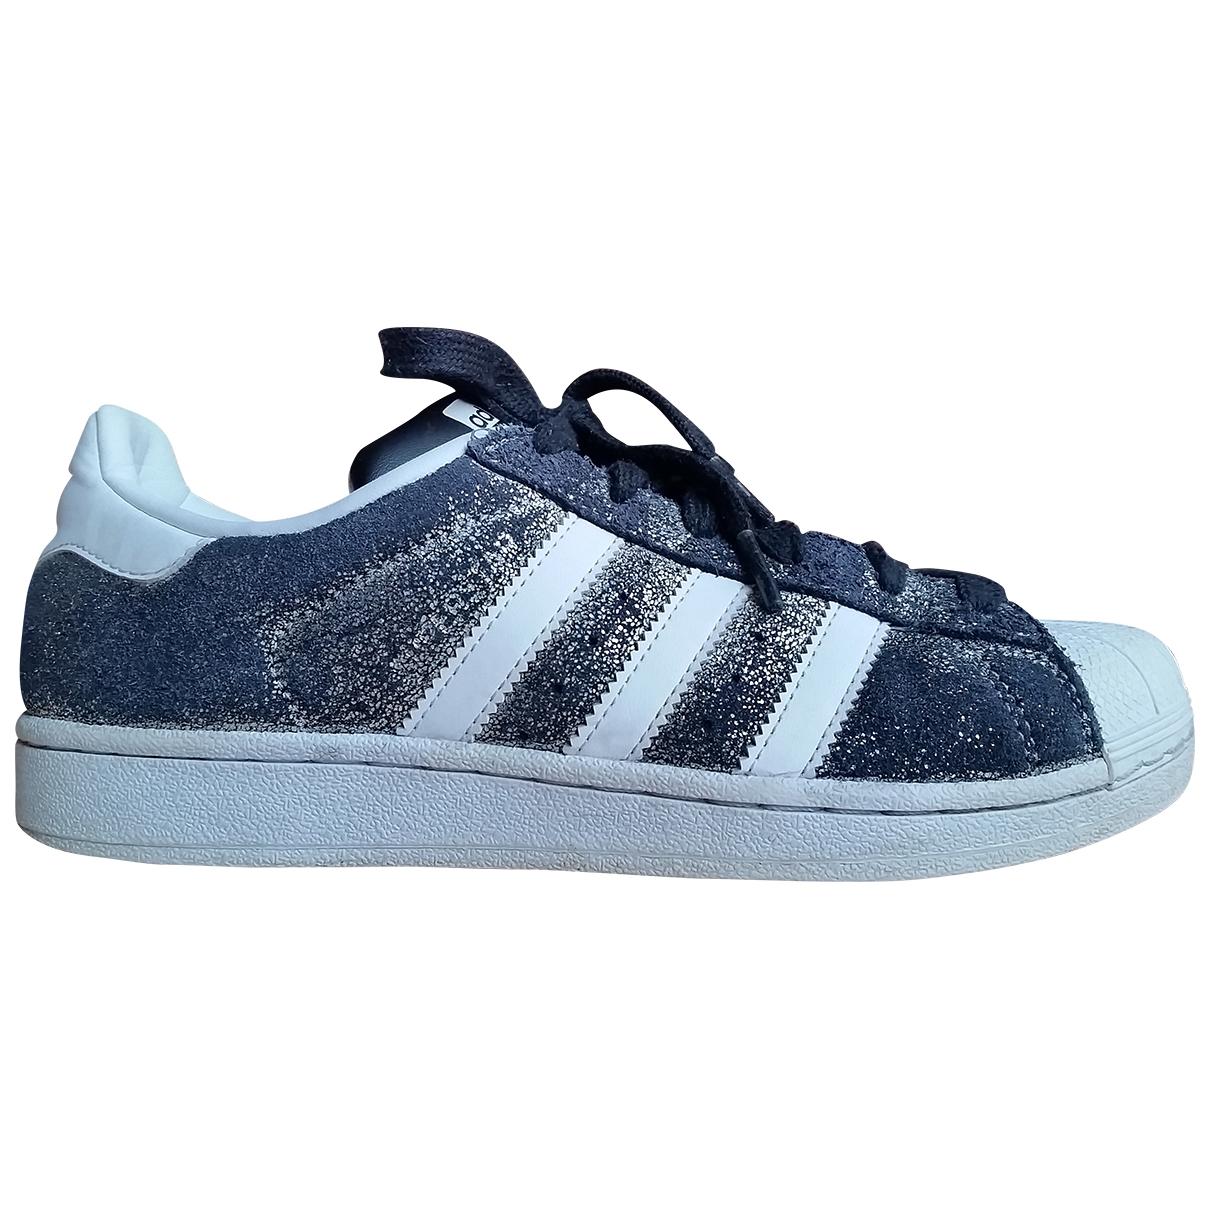 Adidas Superstar Grey Suede Trainers for Women 39.5 EU